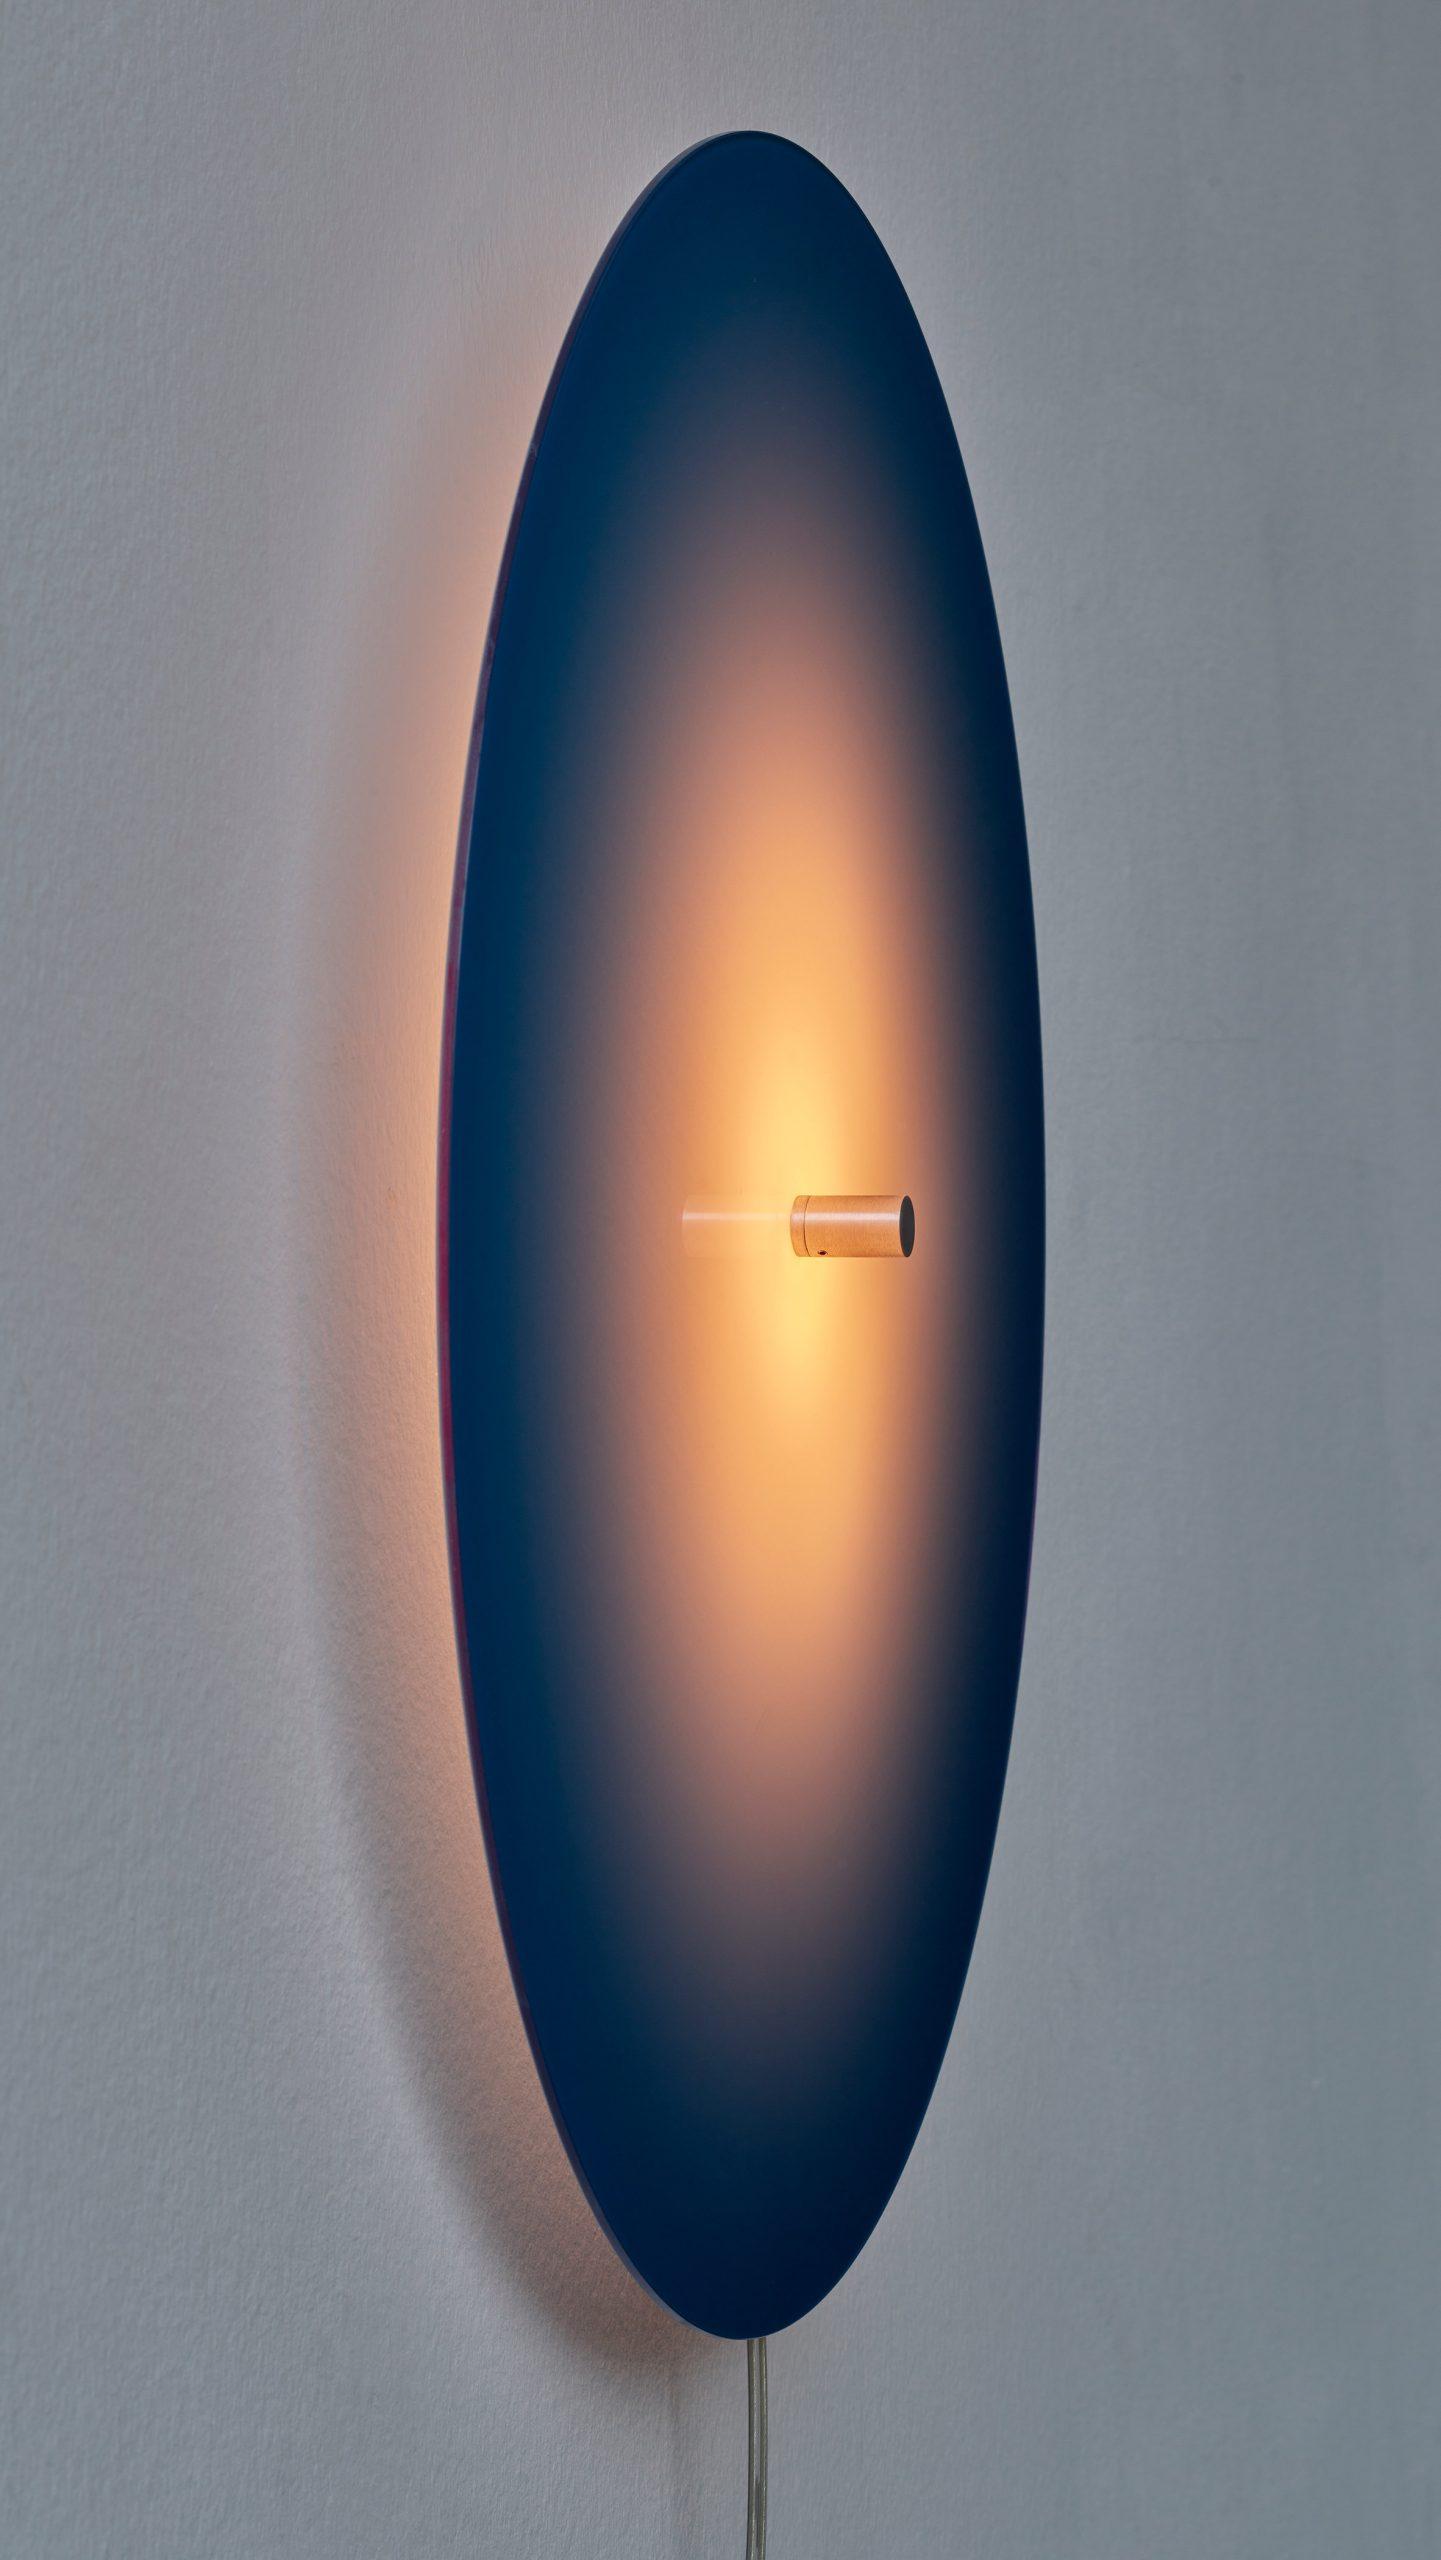 Ombre Light by Mette Schelde in The Mindcraft Project